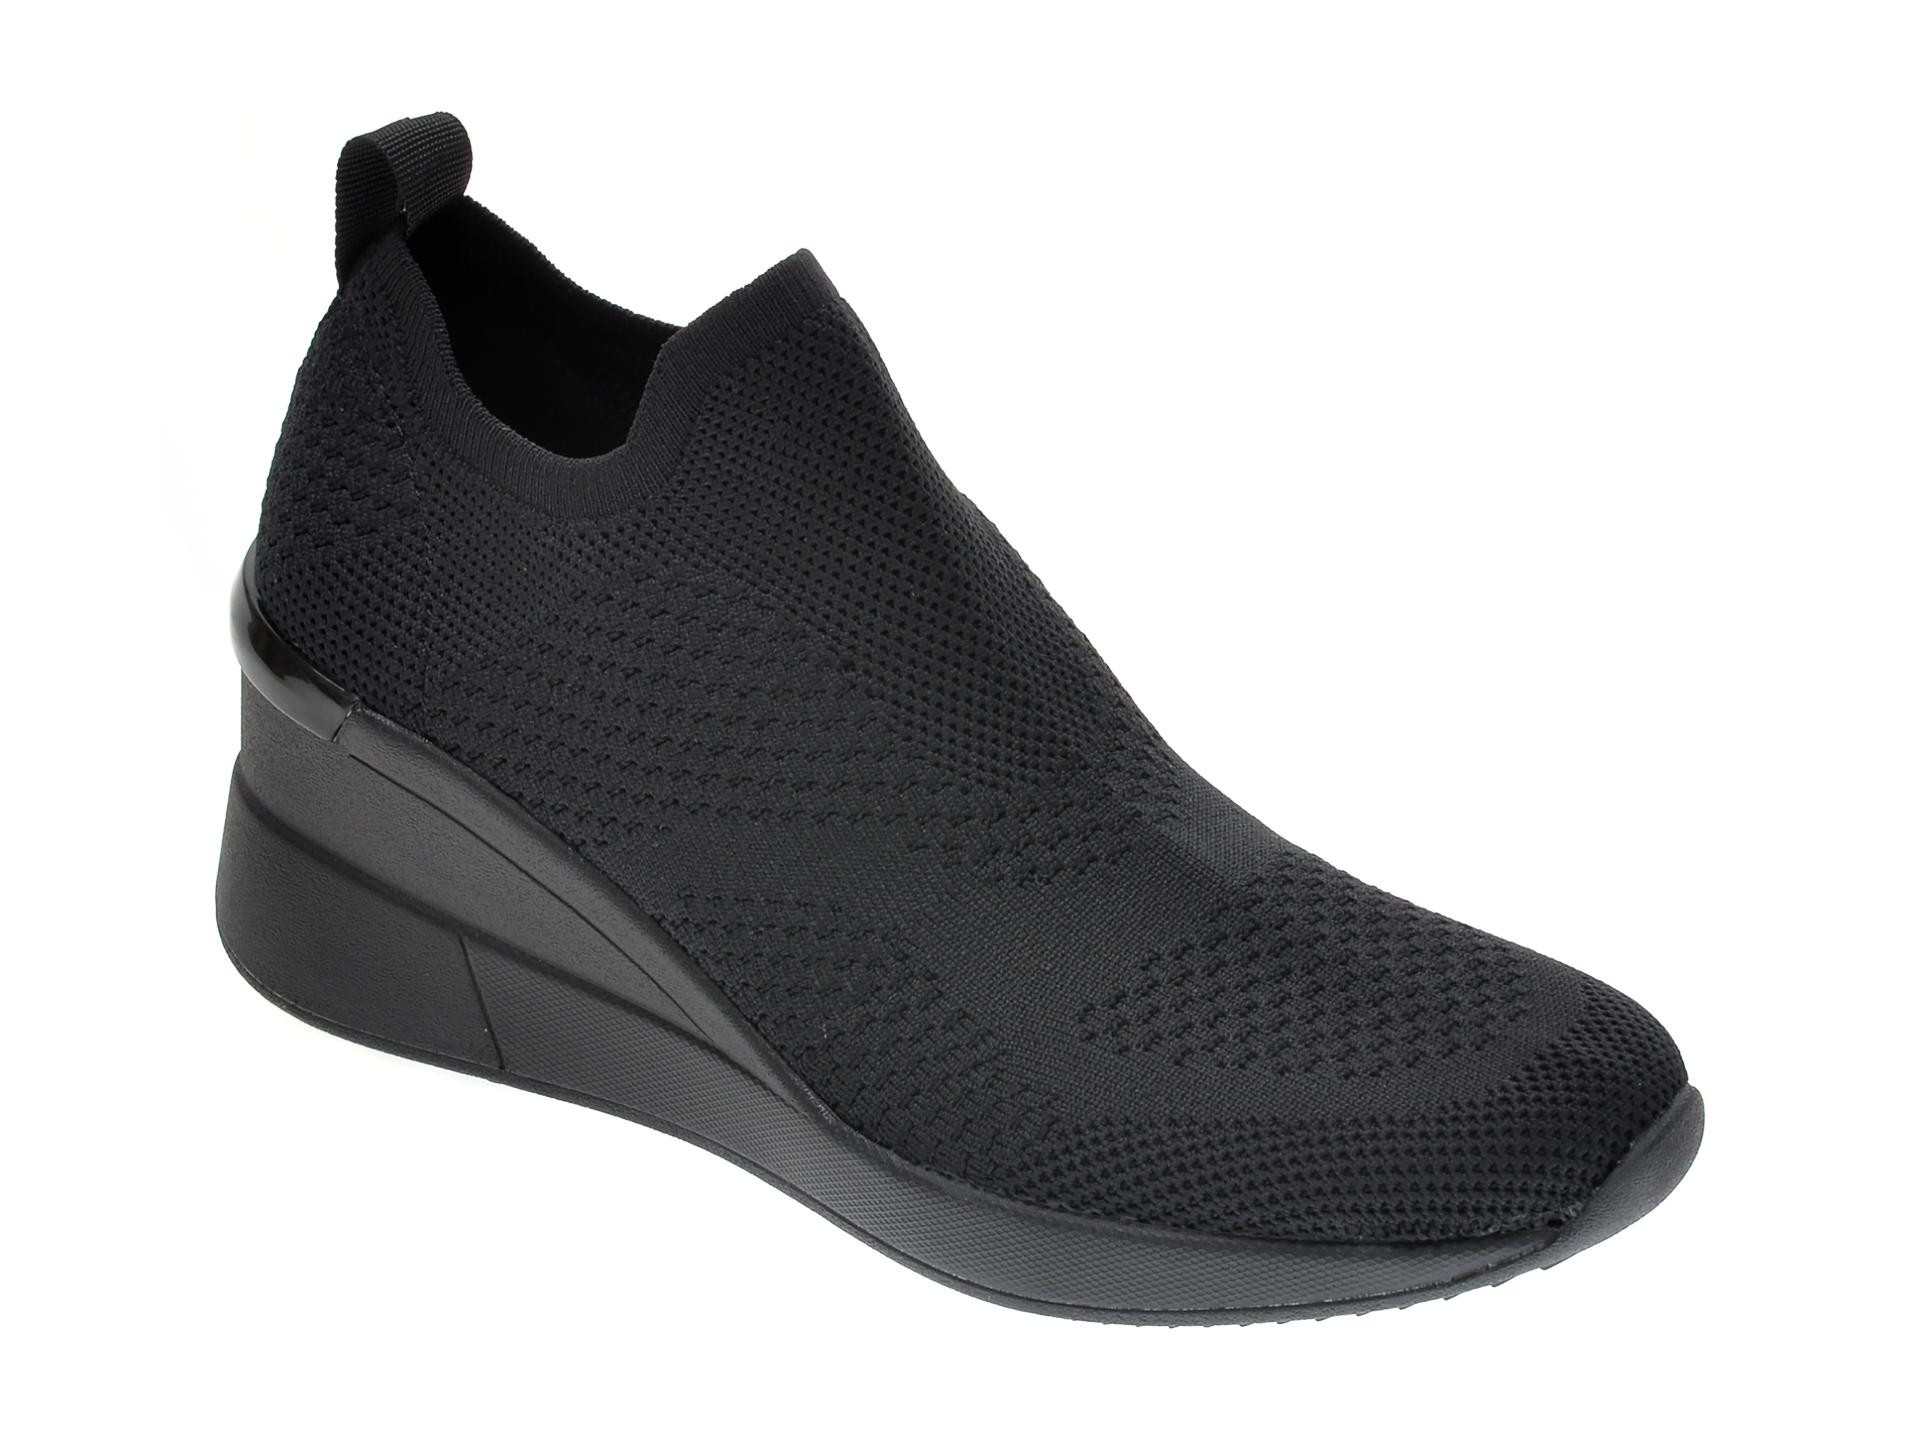 Pantofi ALDO negri, Revicta001, din material textil New